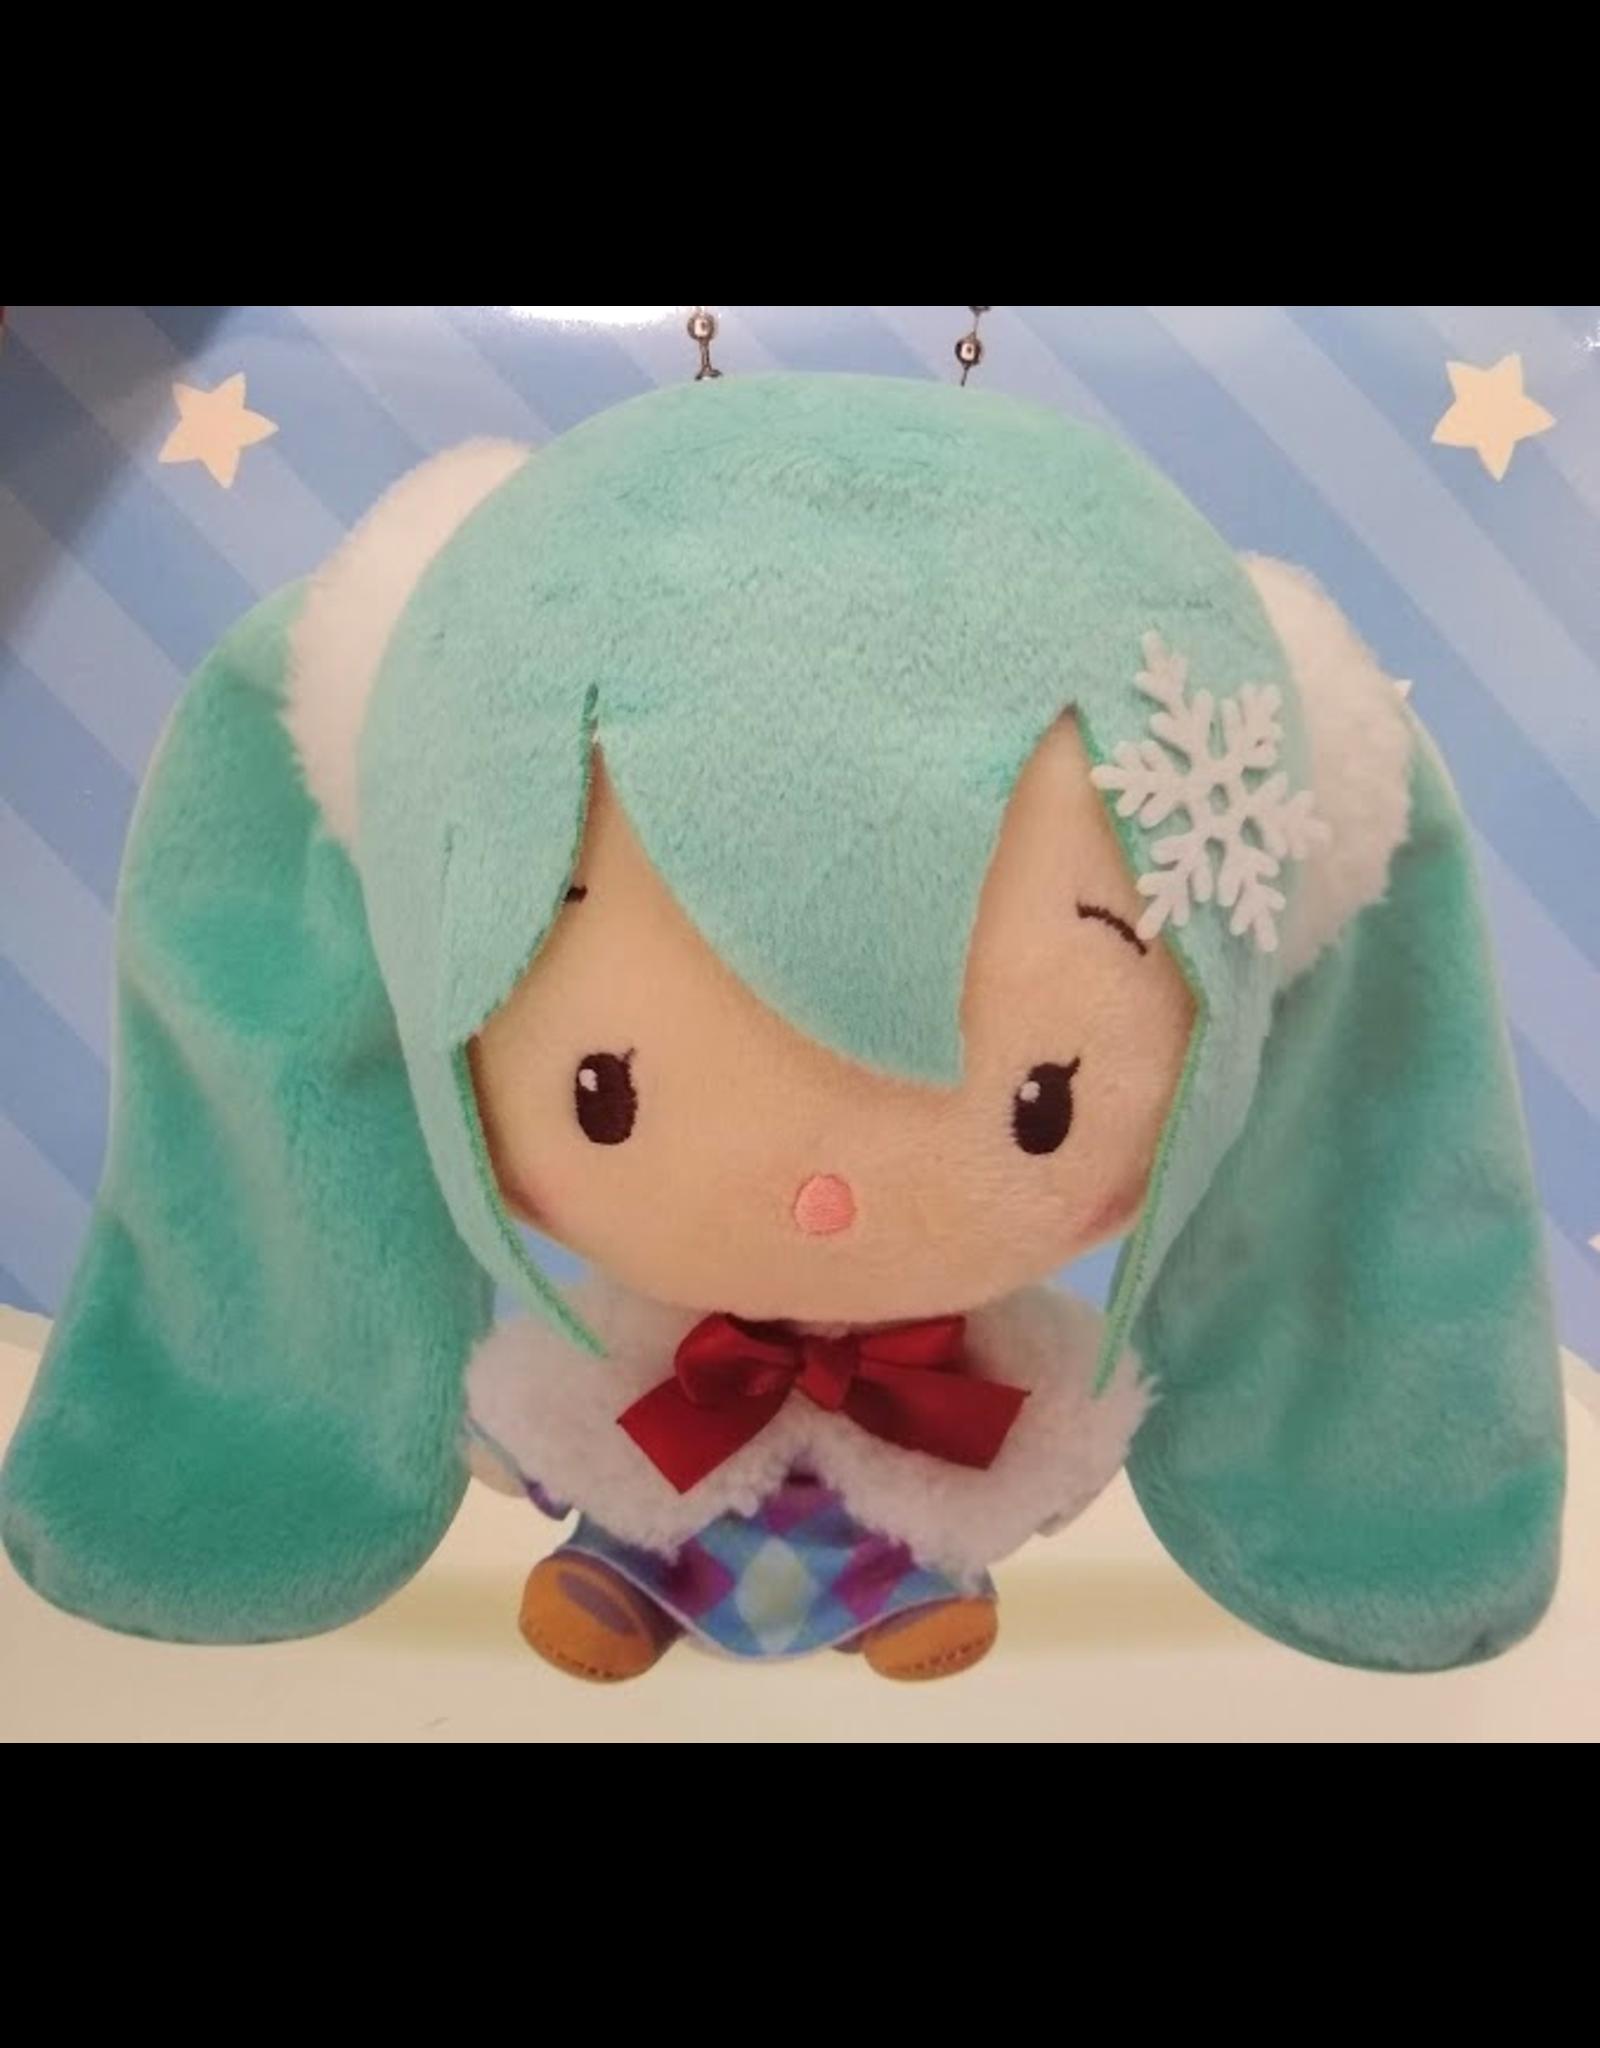 Hatsune Miku Cute Plush Winter Version - Snowflake - 14 cm